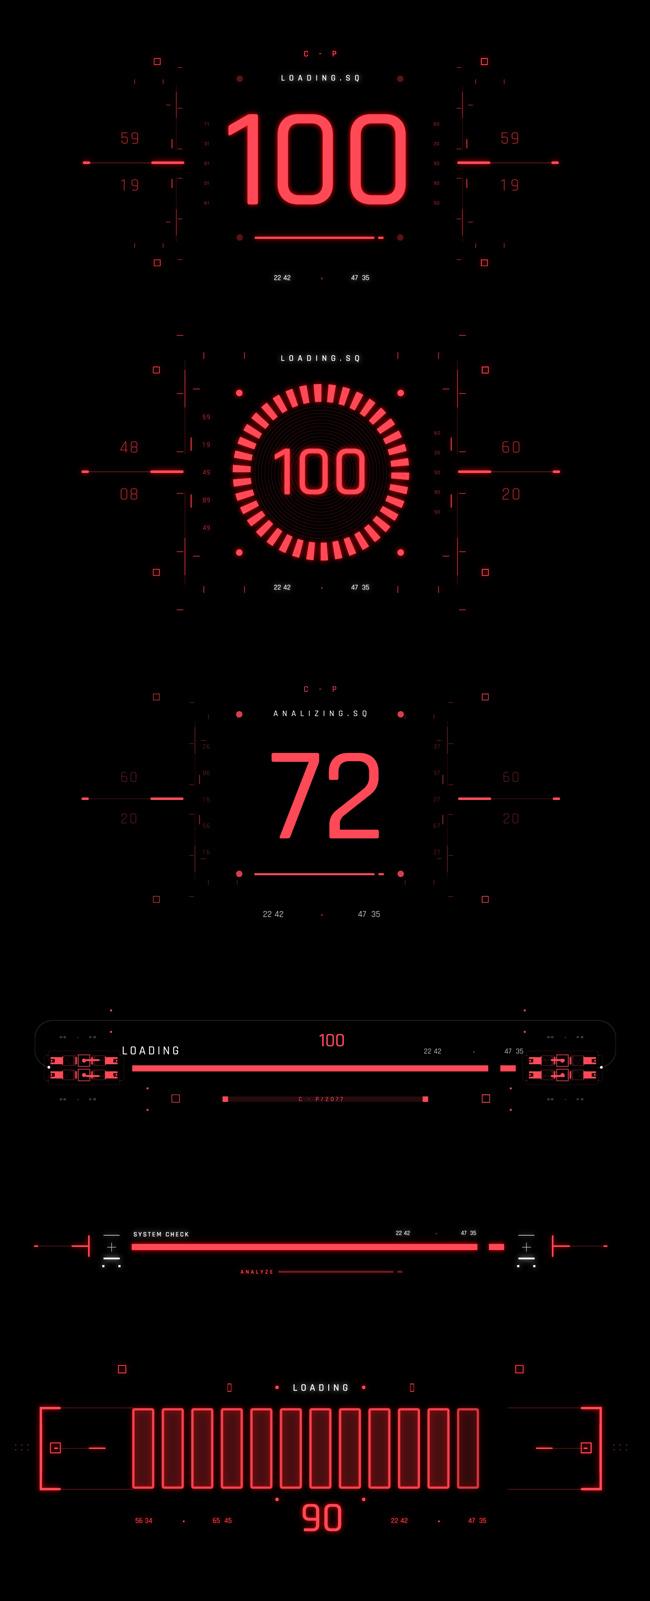 AE脚本-500个HUD高科技赛博朋克UI科幻界面元素动画预设包 Cyberpunk HUD UI 500+ 已修复中文版AE表达式报错插图22